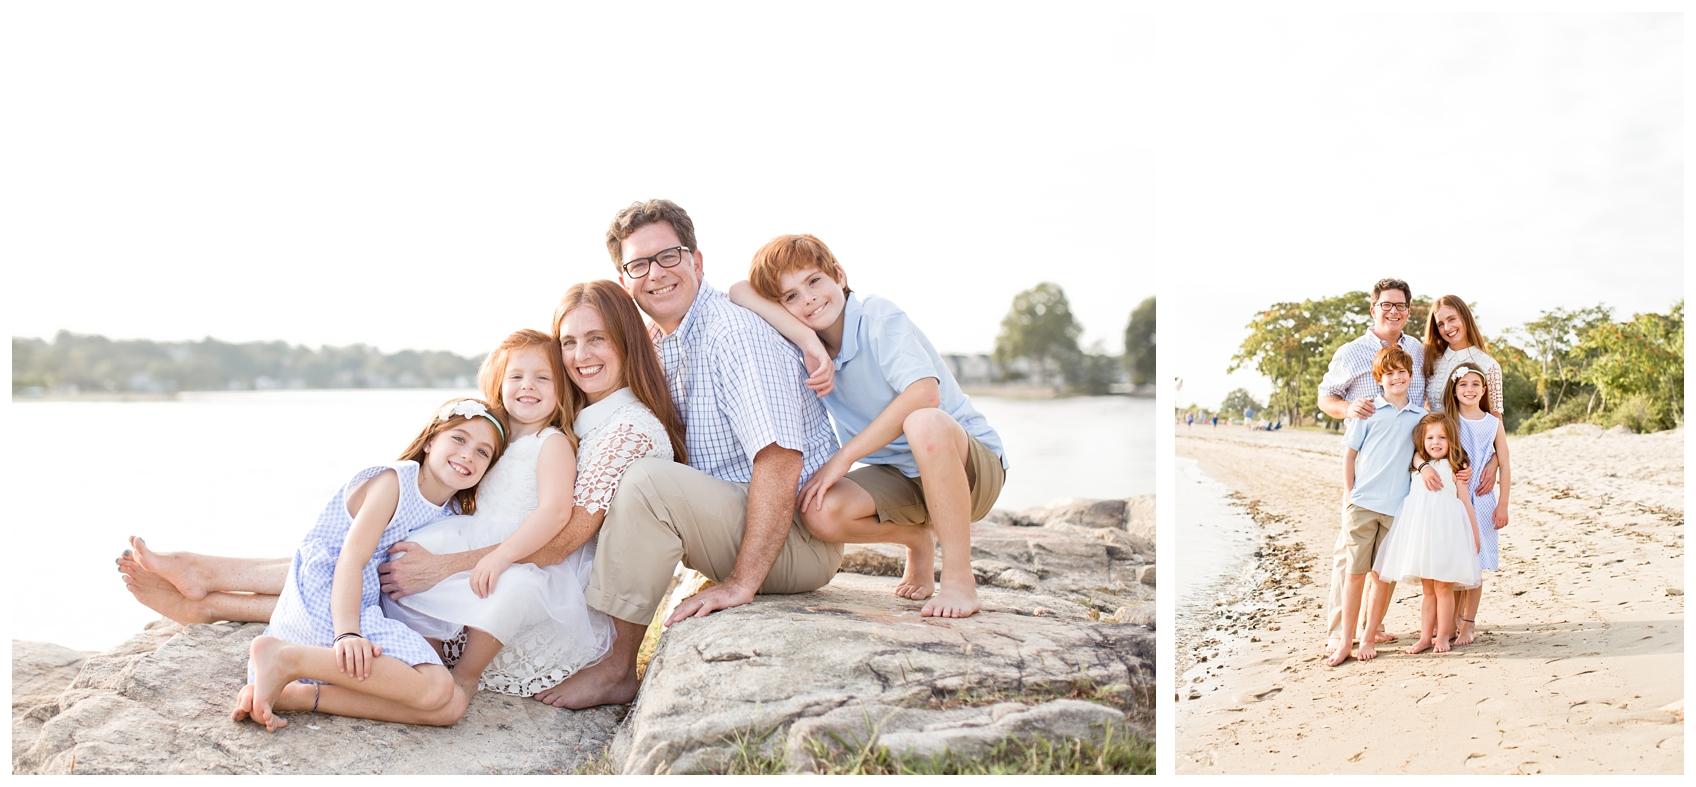 connecticutfamilyphotography.jpg